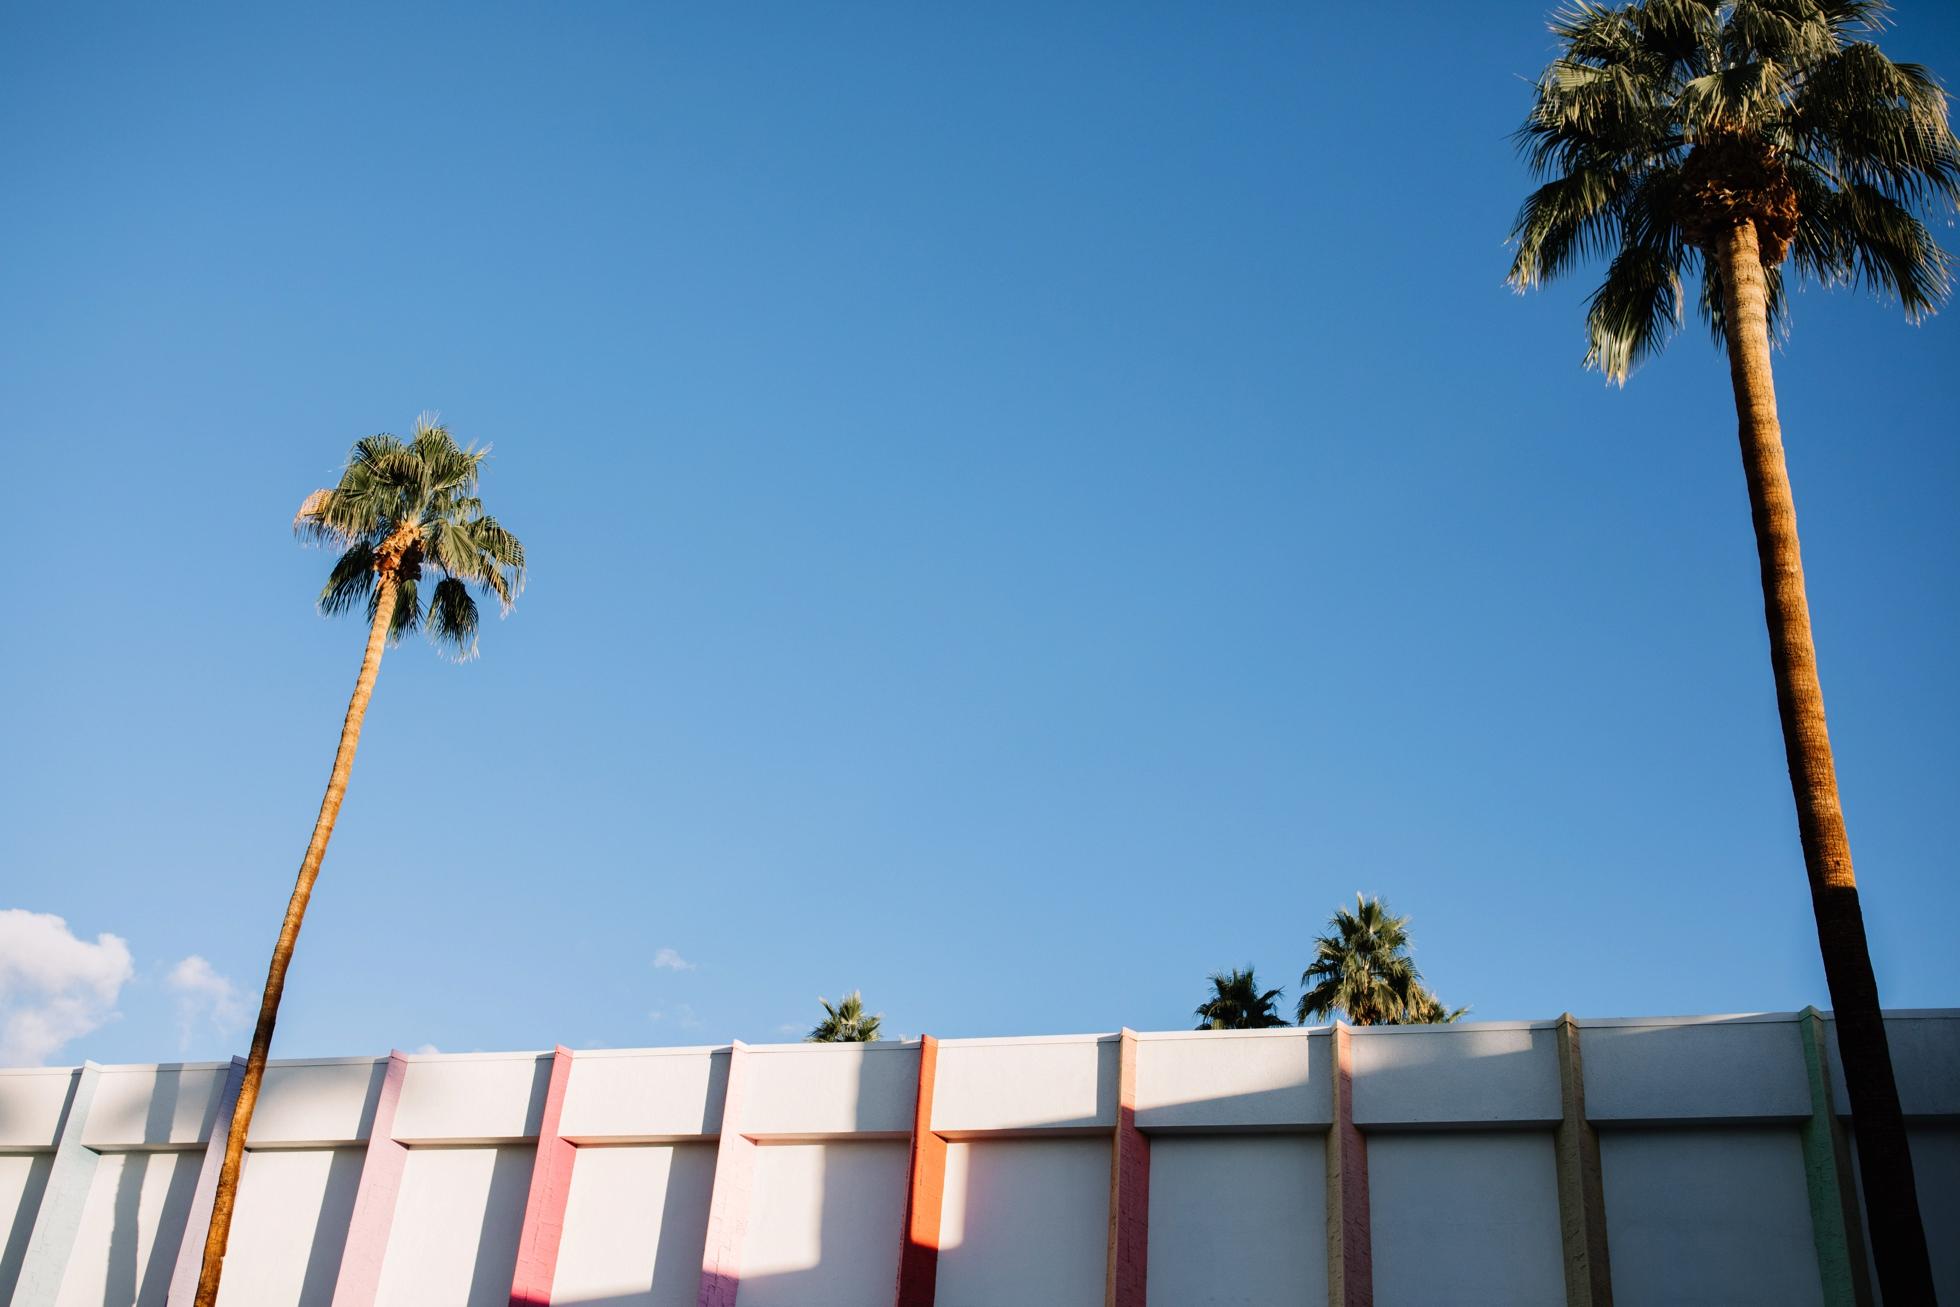 0048-saguaro-hotel-palm-springs-colorful-lodging-ca